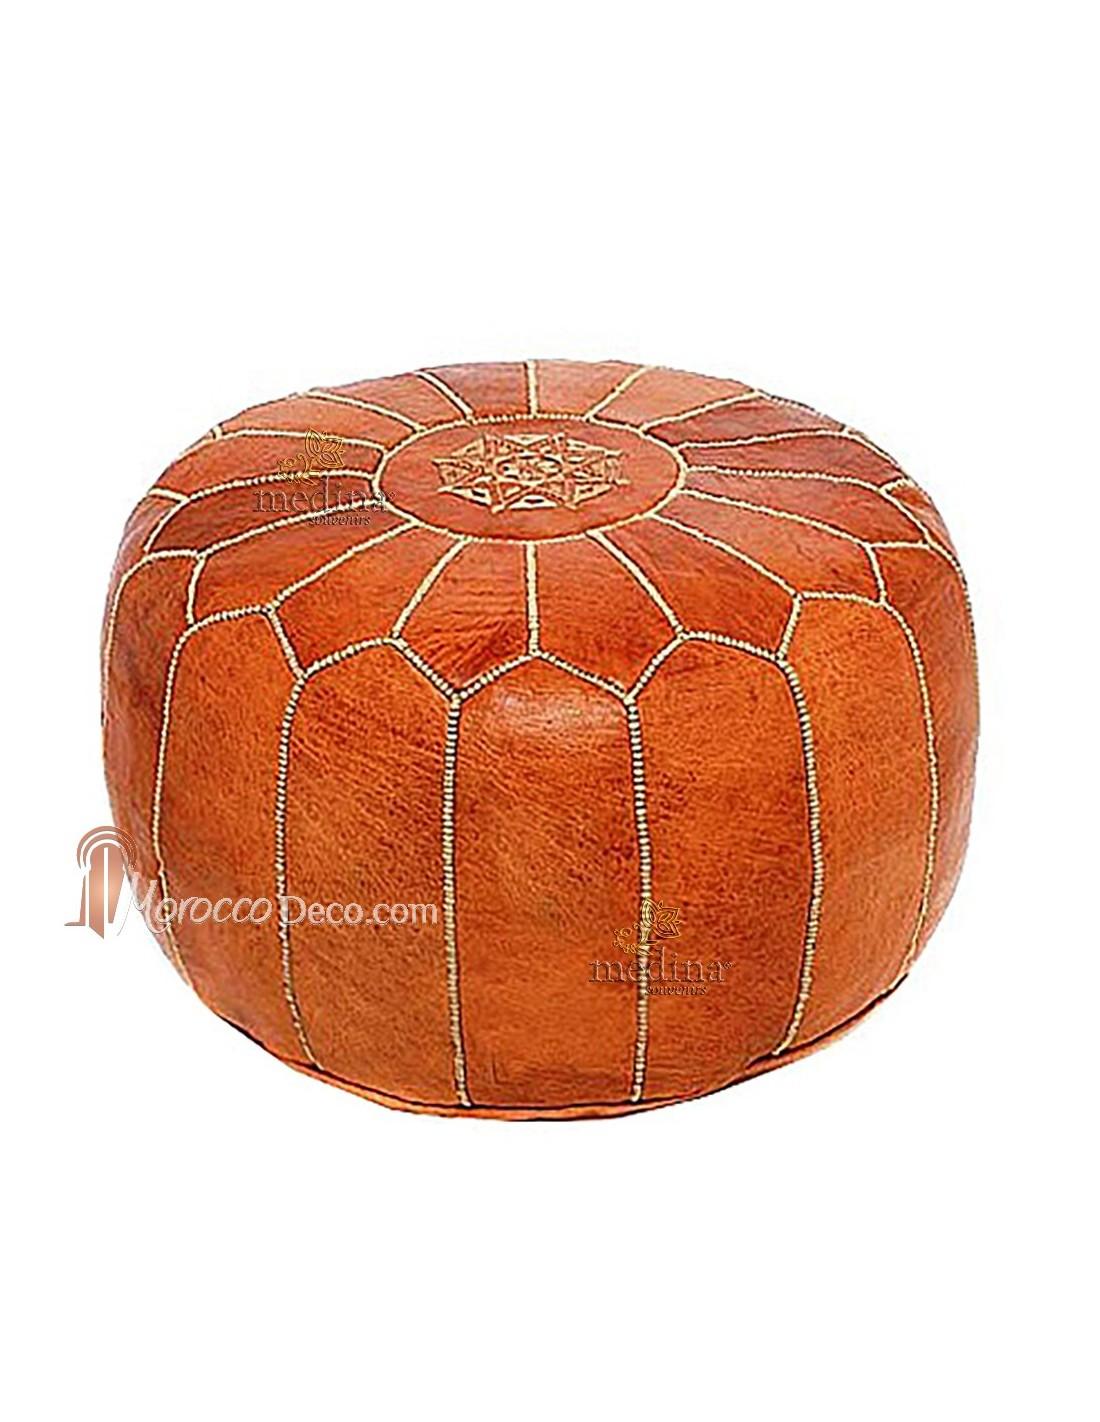 pouf design cuir marocain marron fabriqu et cosu la main. Black Bedroom Furniture Sets. Home Design Ideas